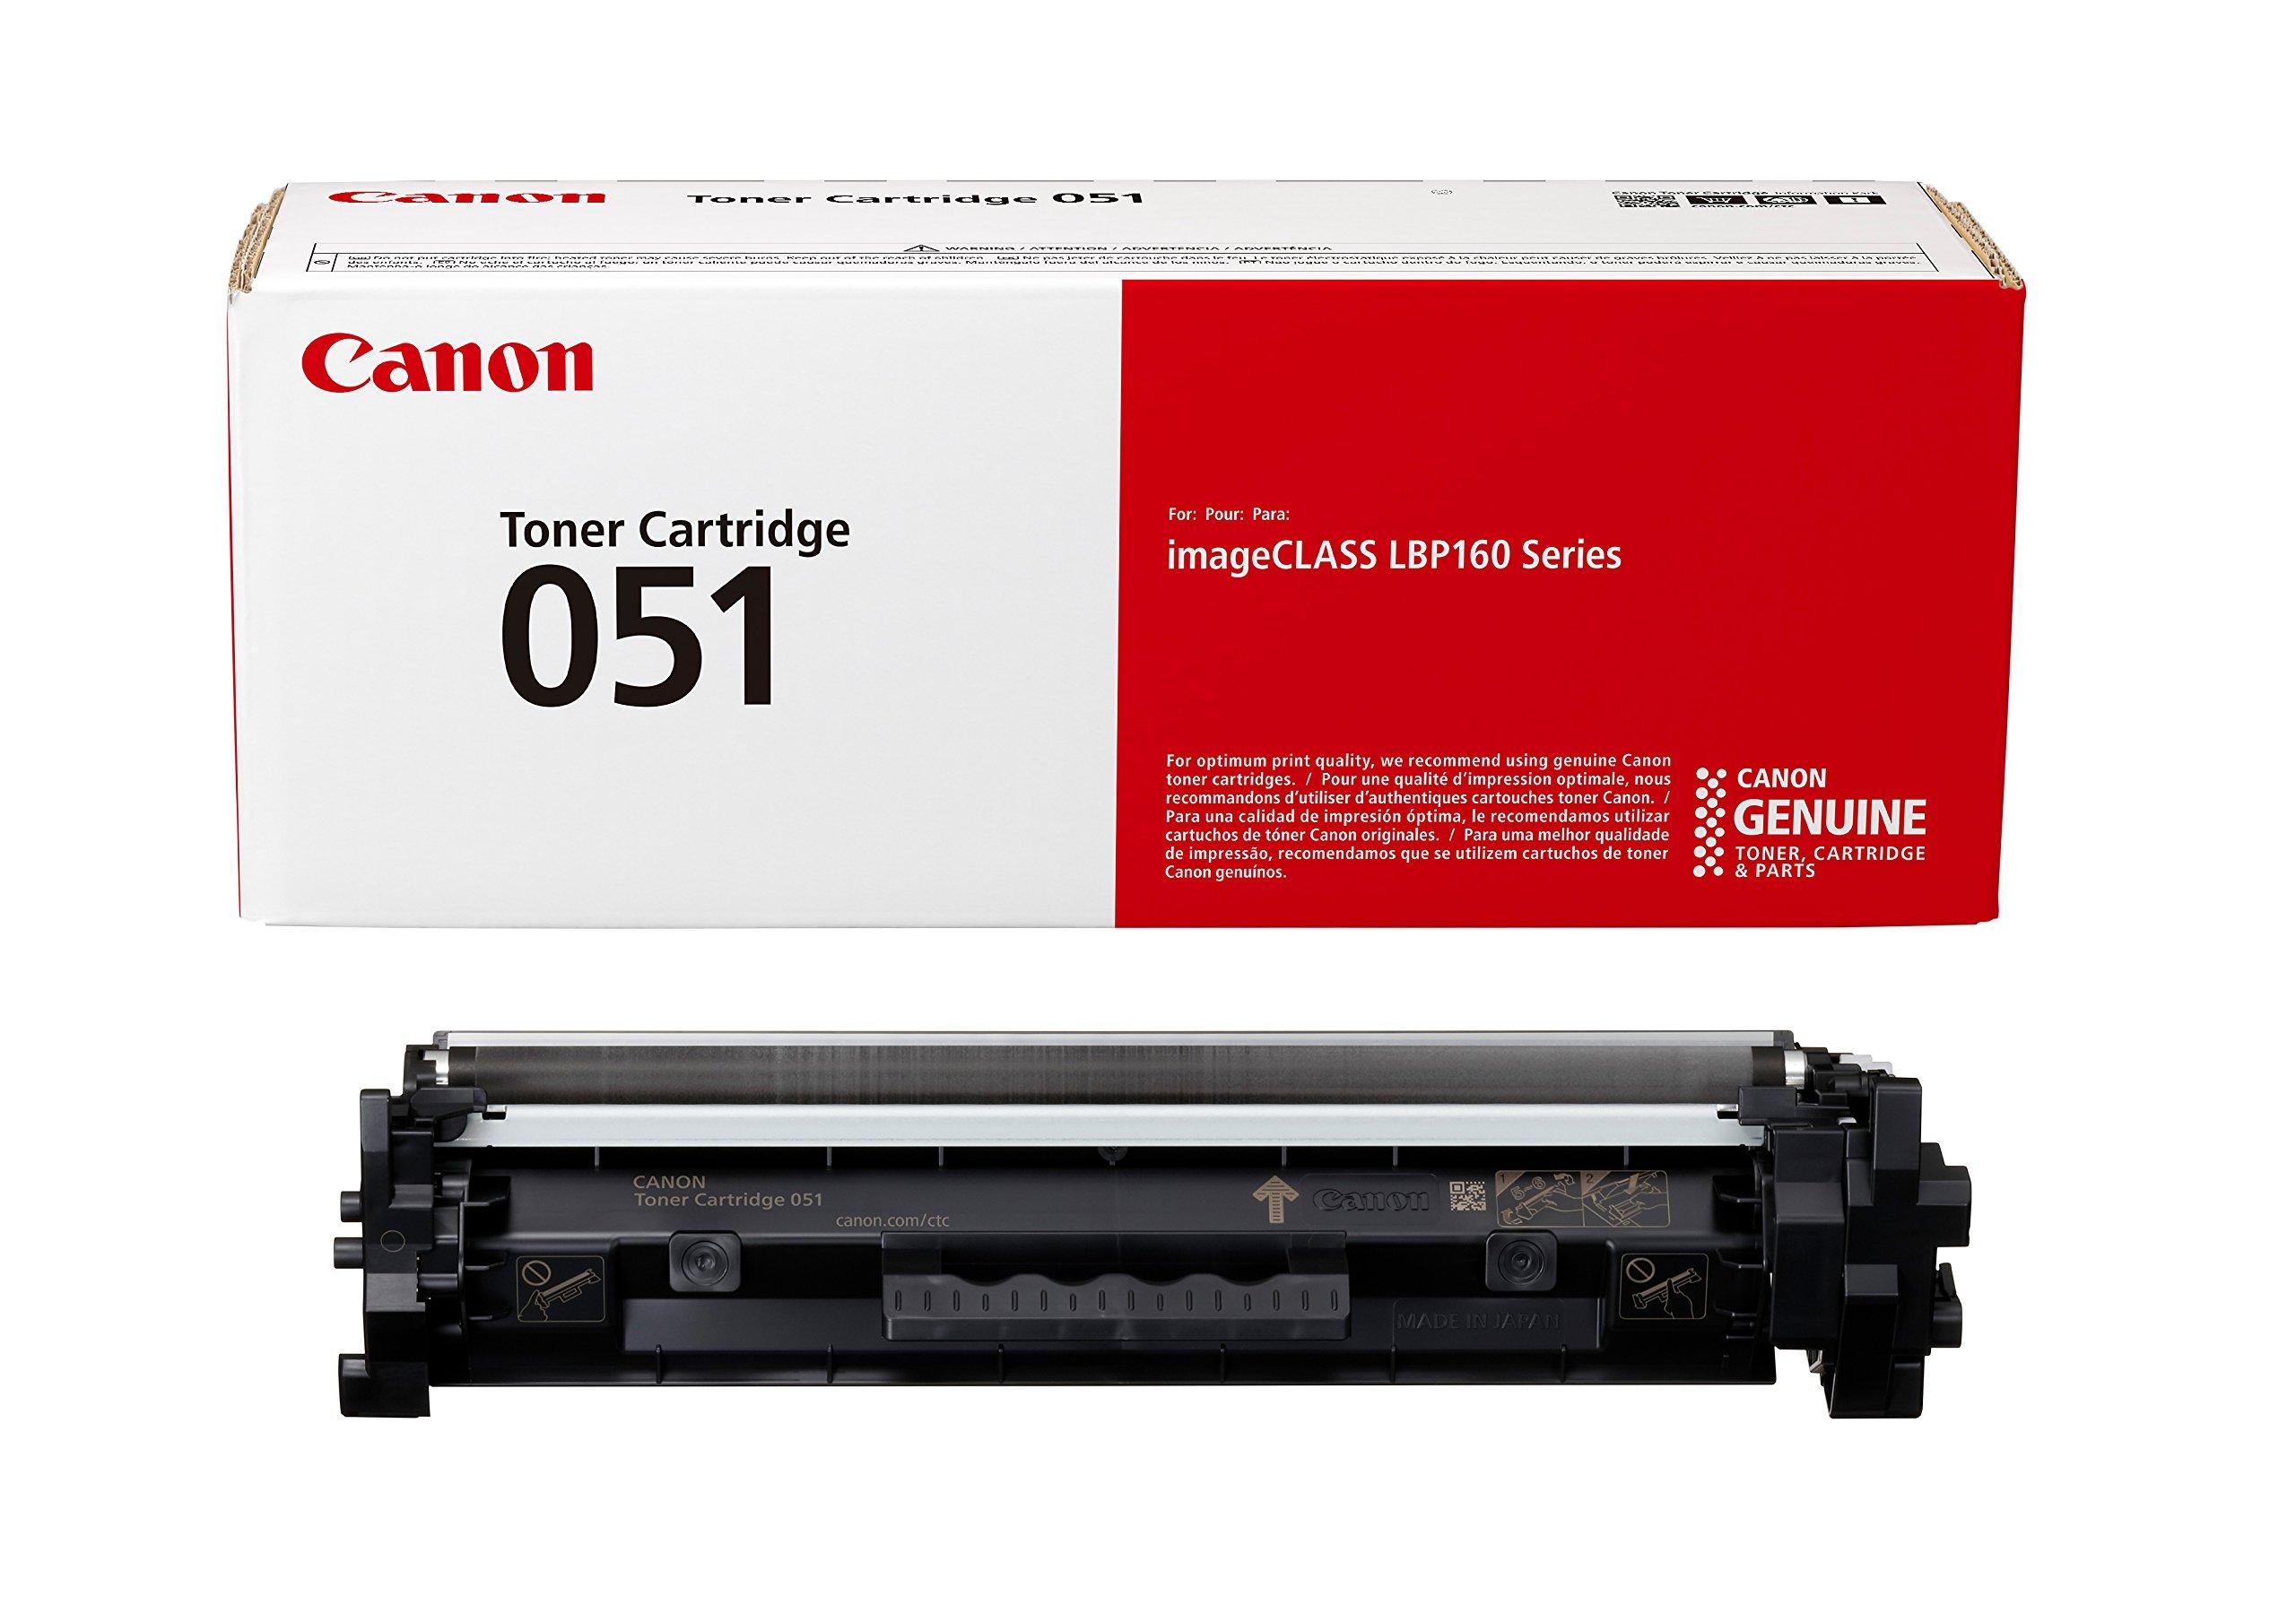 Canon Genuine Toner Cartridge 051 Black (2168C001), 1-Pack, for Canon imageCLASS MF264dw, MF267dw, MF269dw, LBP162dw Laser Printers